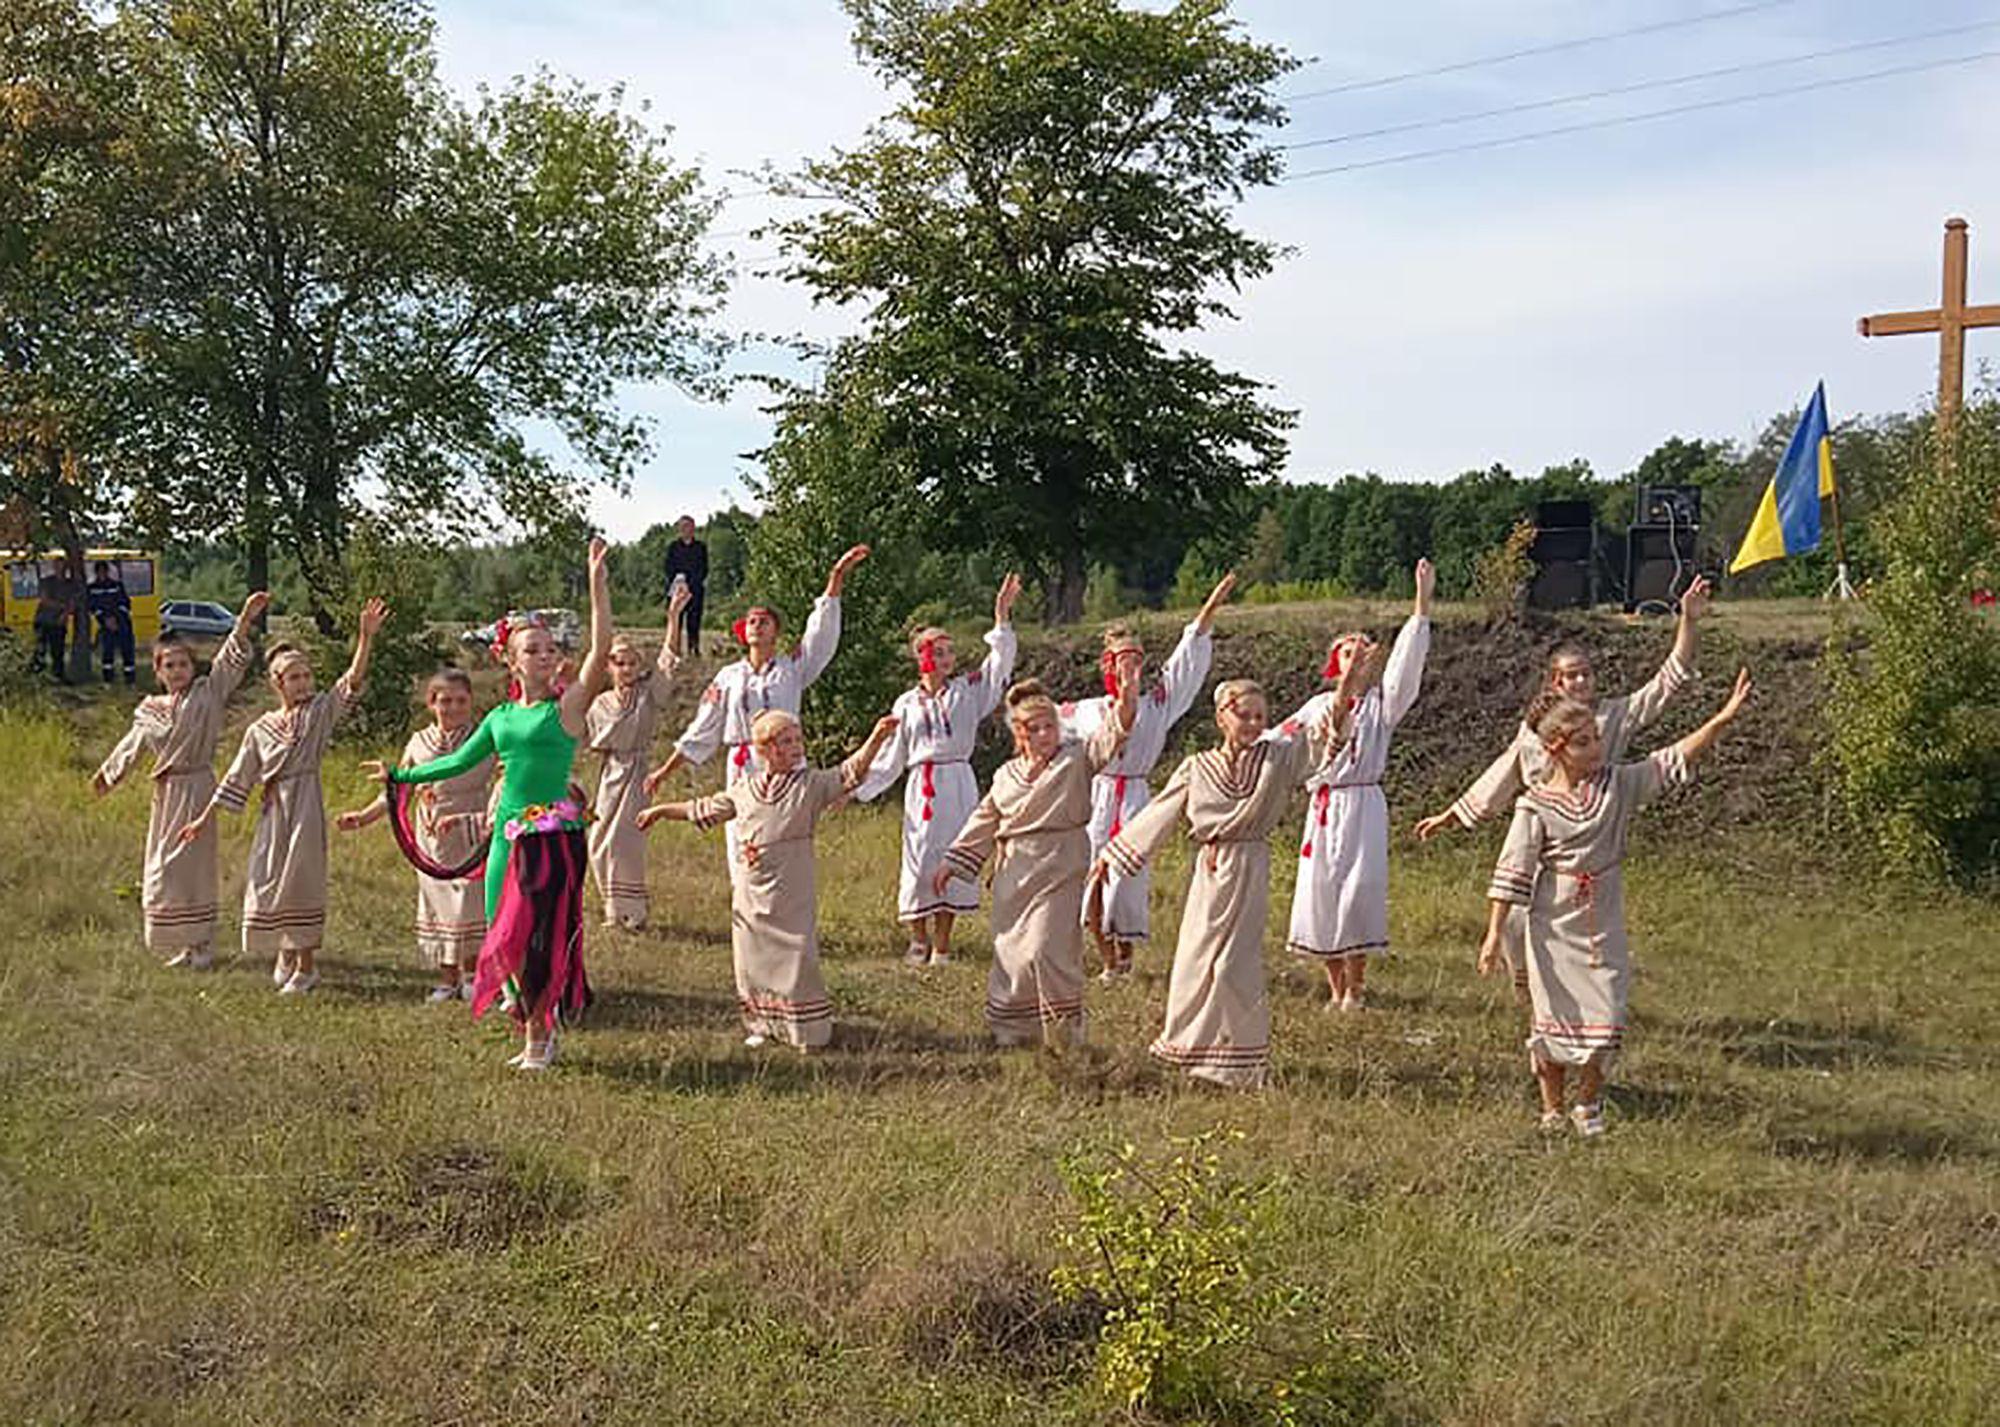 Житомирщина: На полі кривавої битви освятили хрест